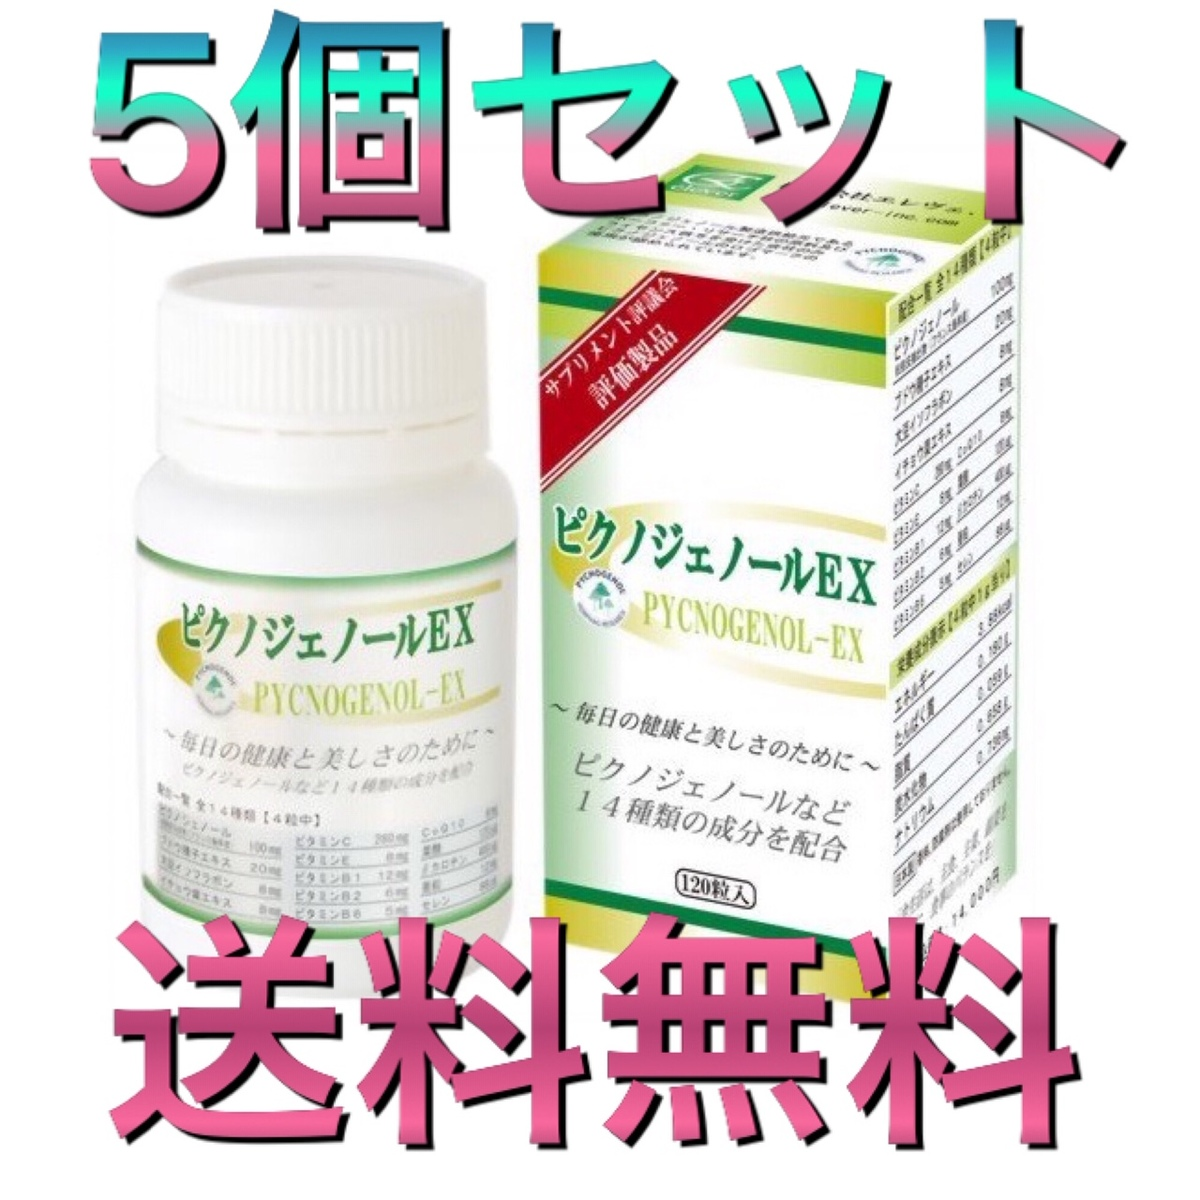 CoQ10 イソフラボン イチョウ葉 セレン 配合 5個セット ピクノジェノールEX 120粒 エレヴェ 日本製 美容サプリ